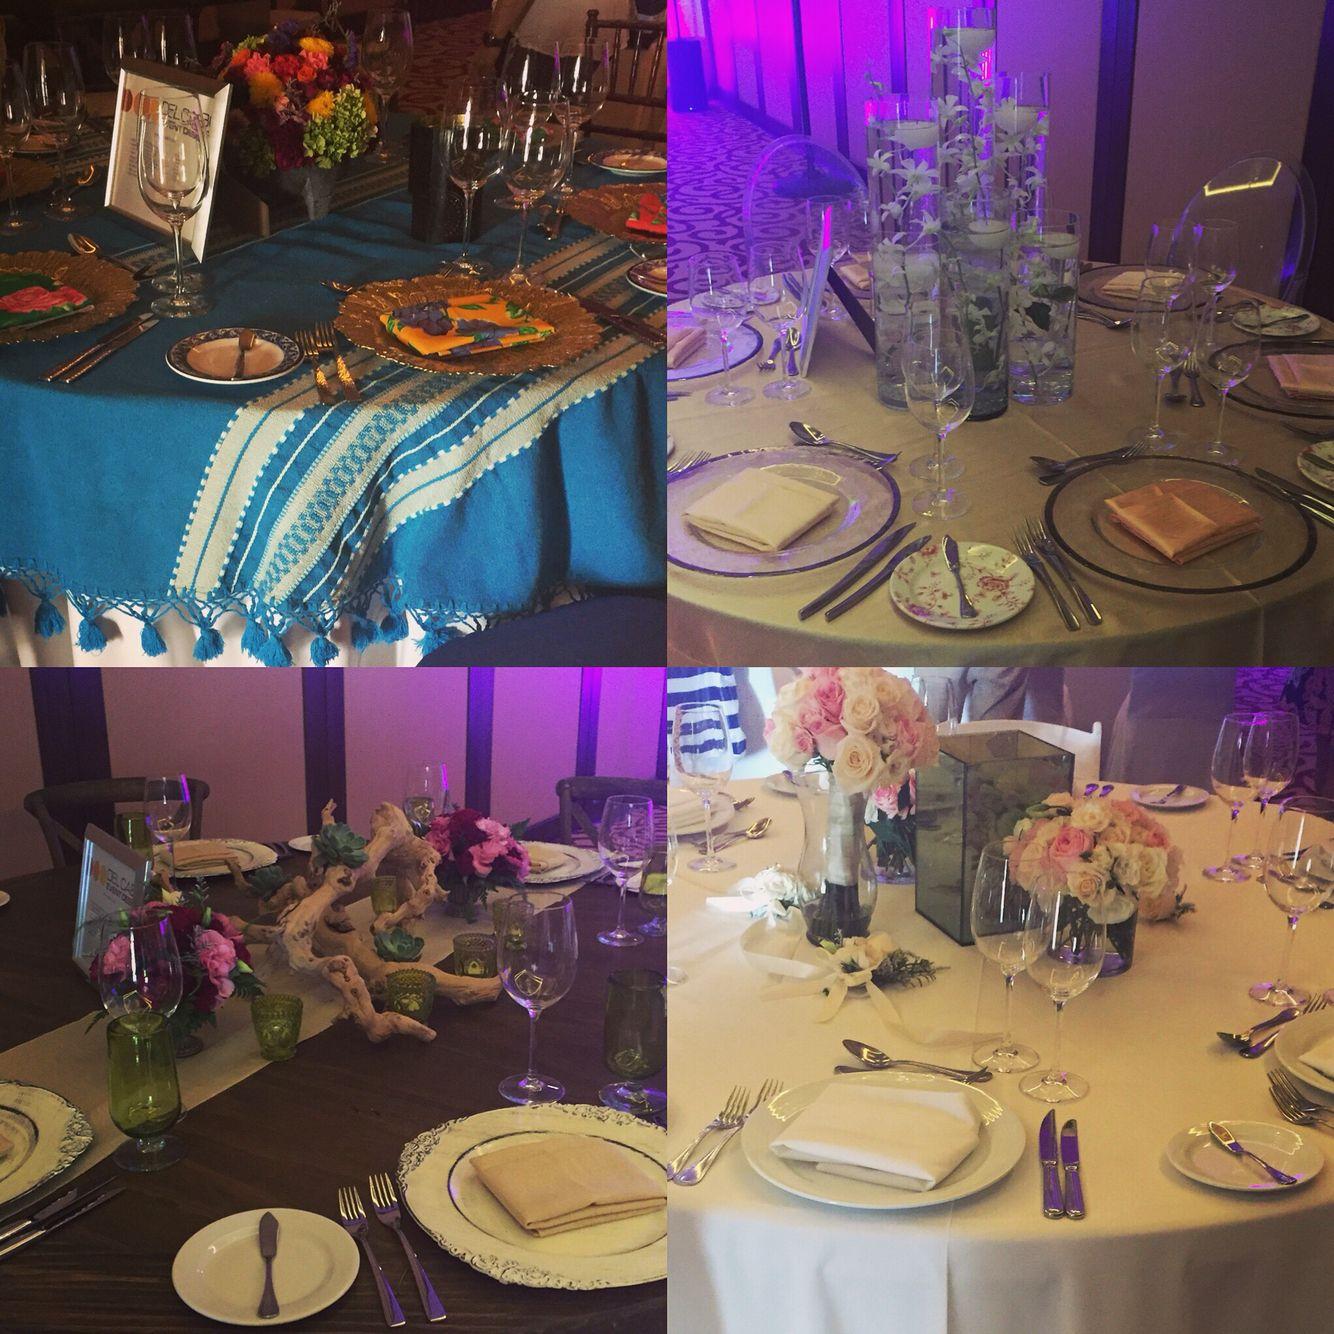 Stylish Wedding Ceremony Decor: An Example Of Decor Options For A Destination Wedding